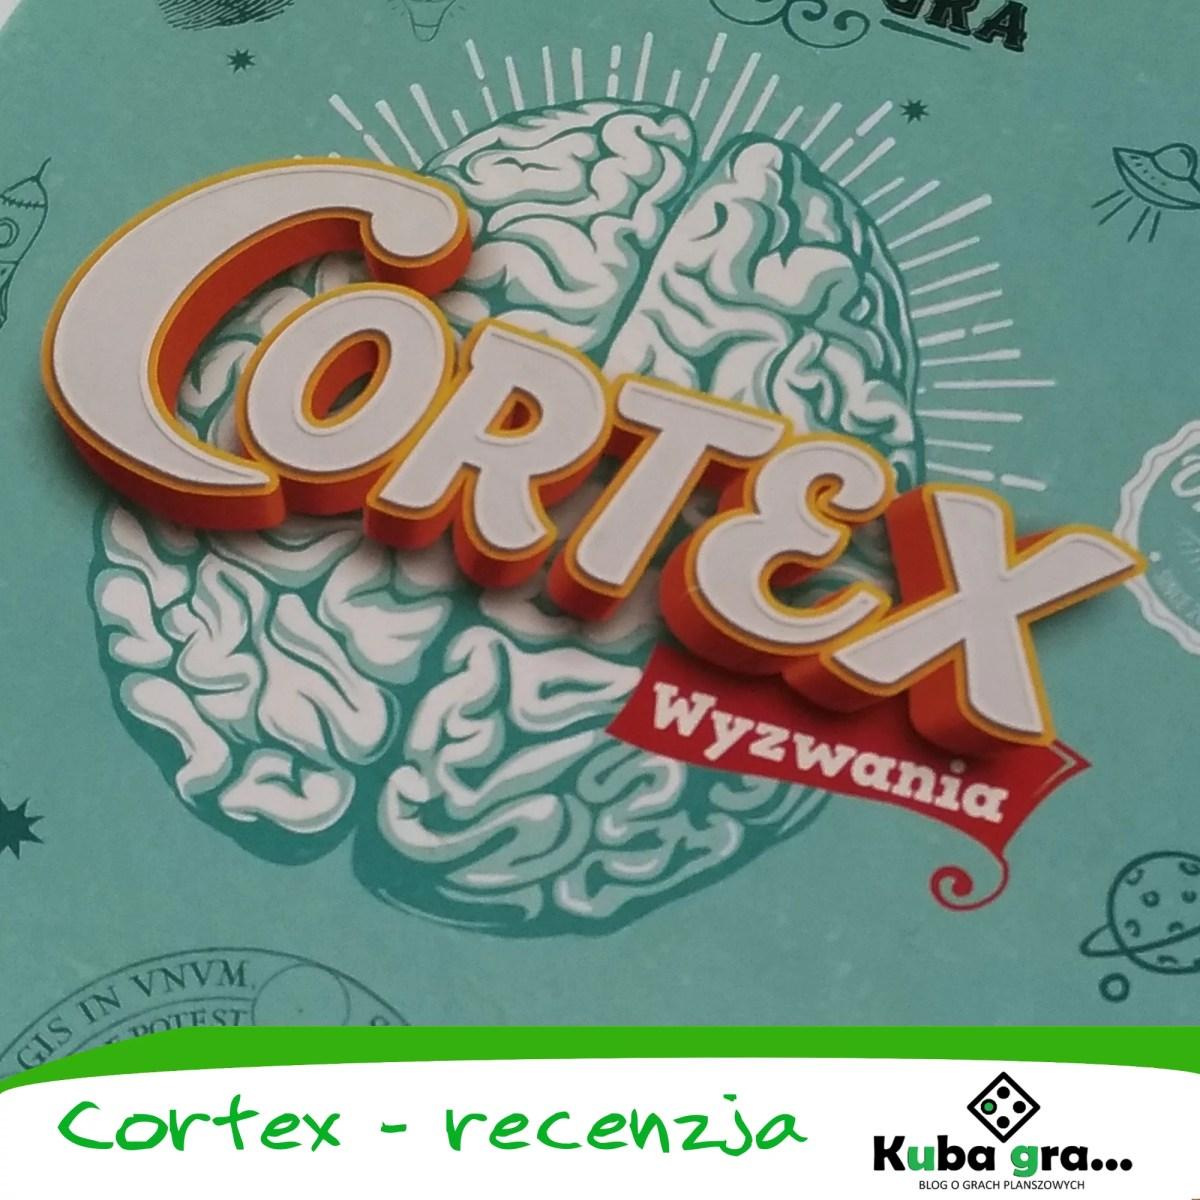 Cortex - recenzja